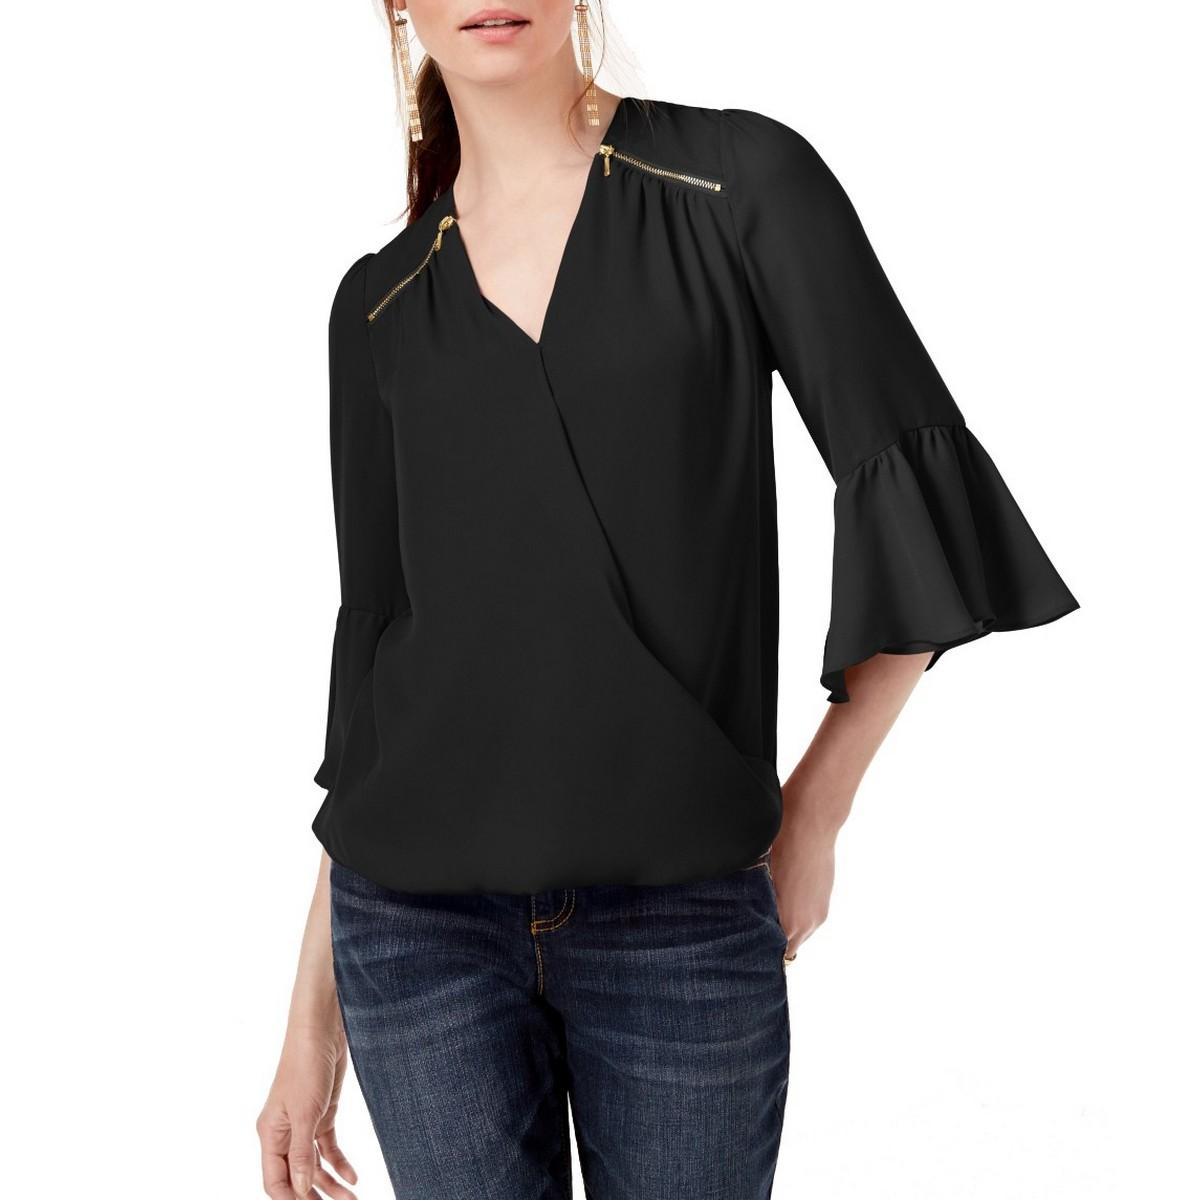 INC NEW Women's Black Zip-detail Surplice Bell Sleeves Blous